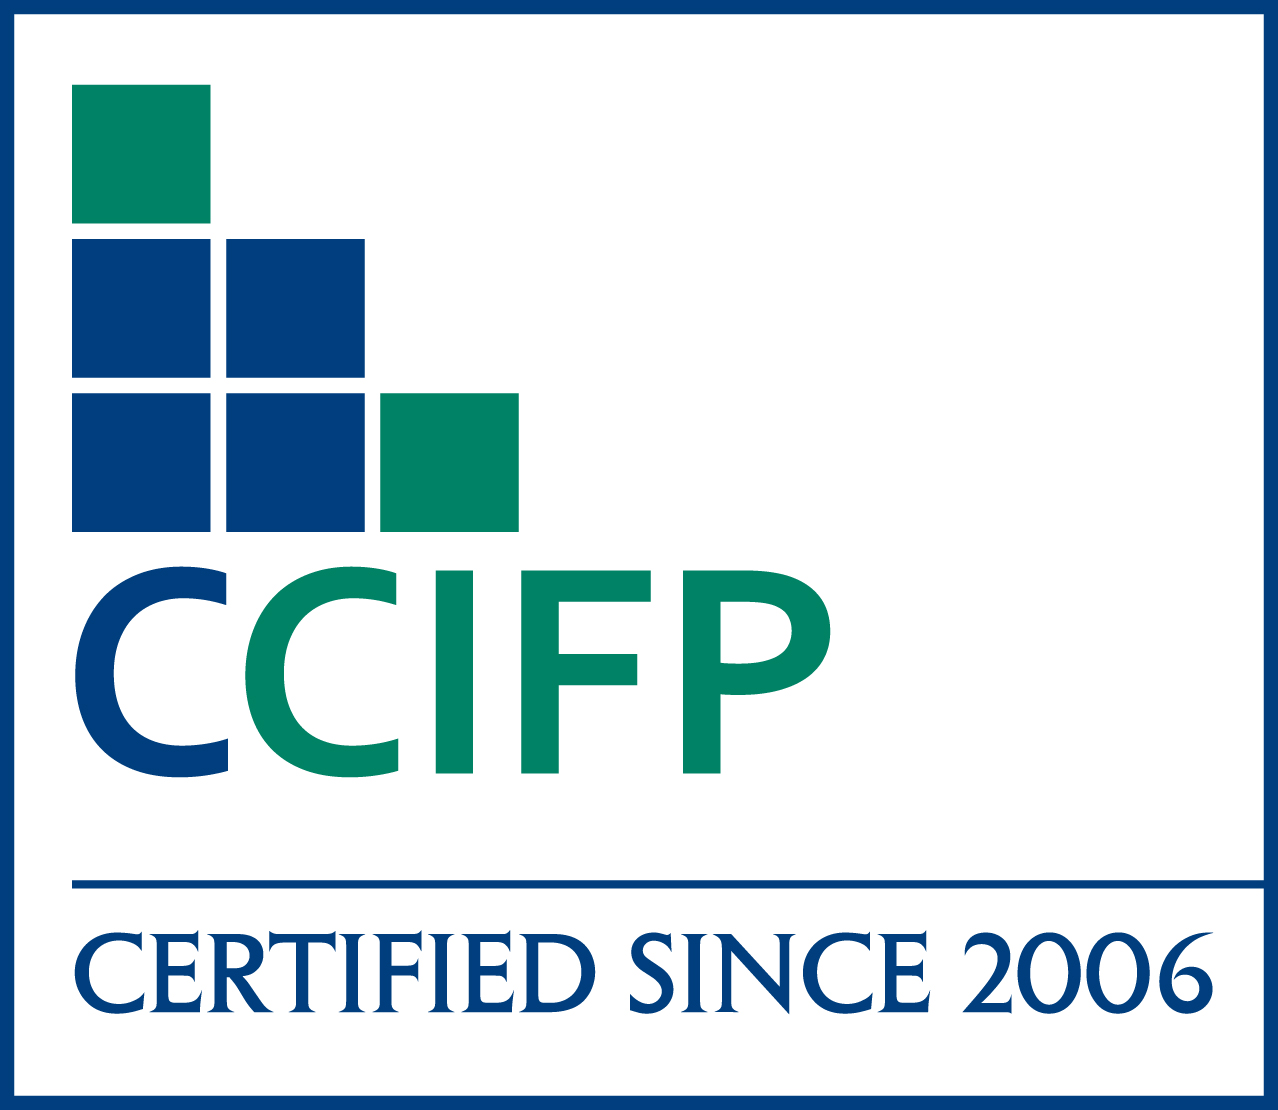 Scott Morrison, CPA, CCIFP • Managing Partner -